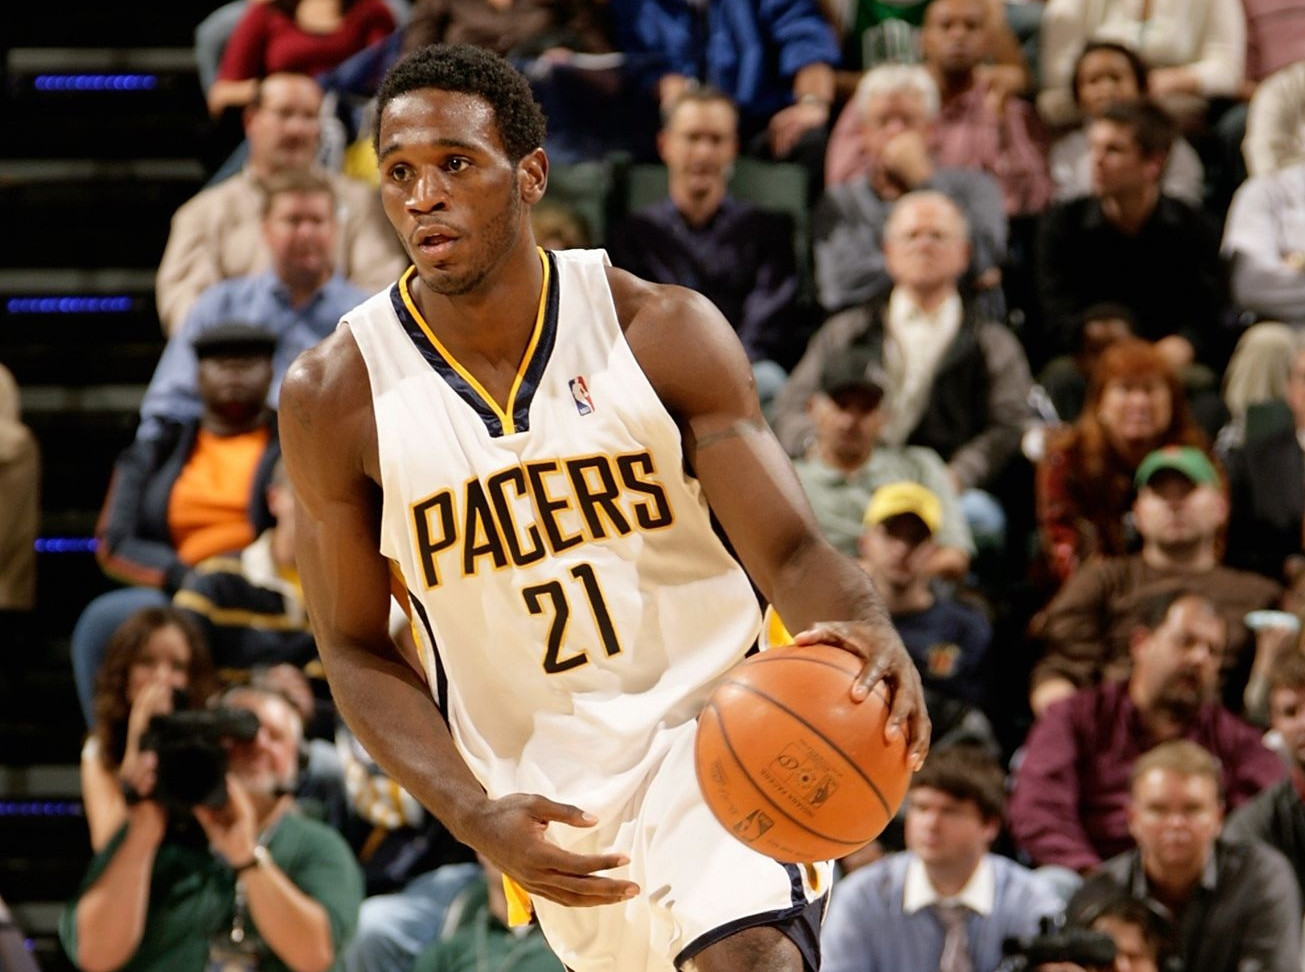 Kareem Rush, Indiana Pacers